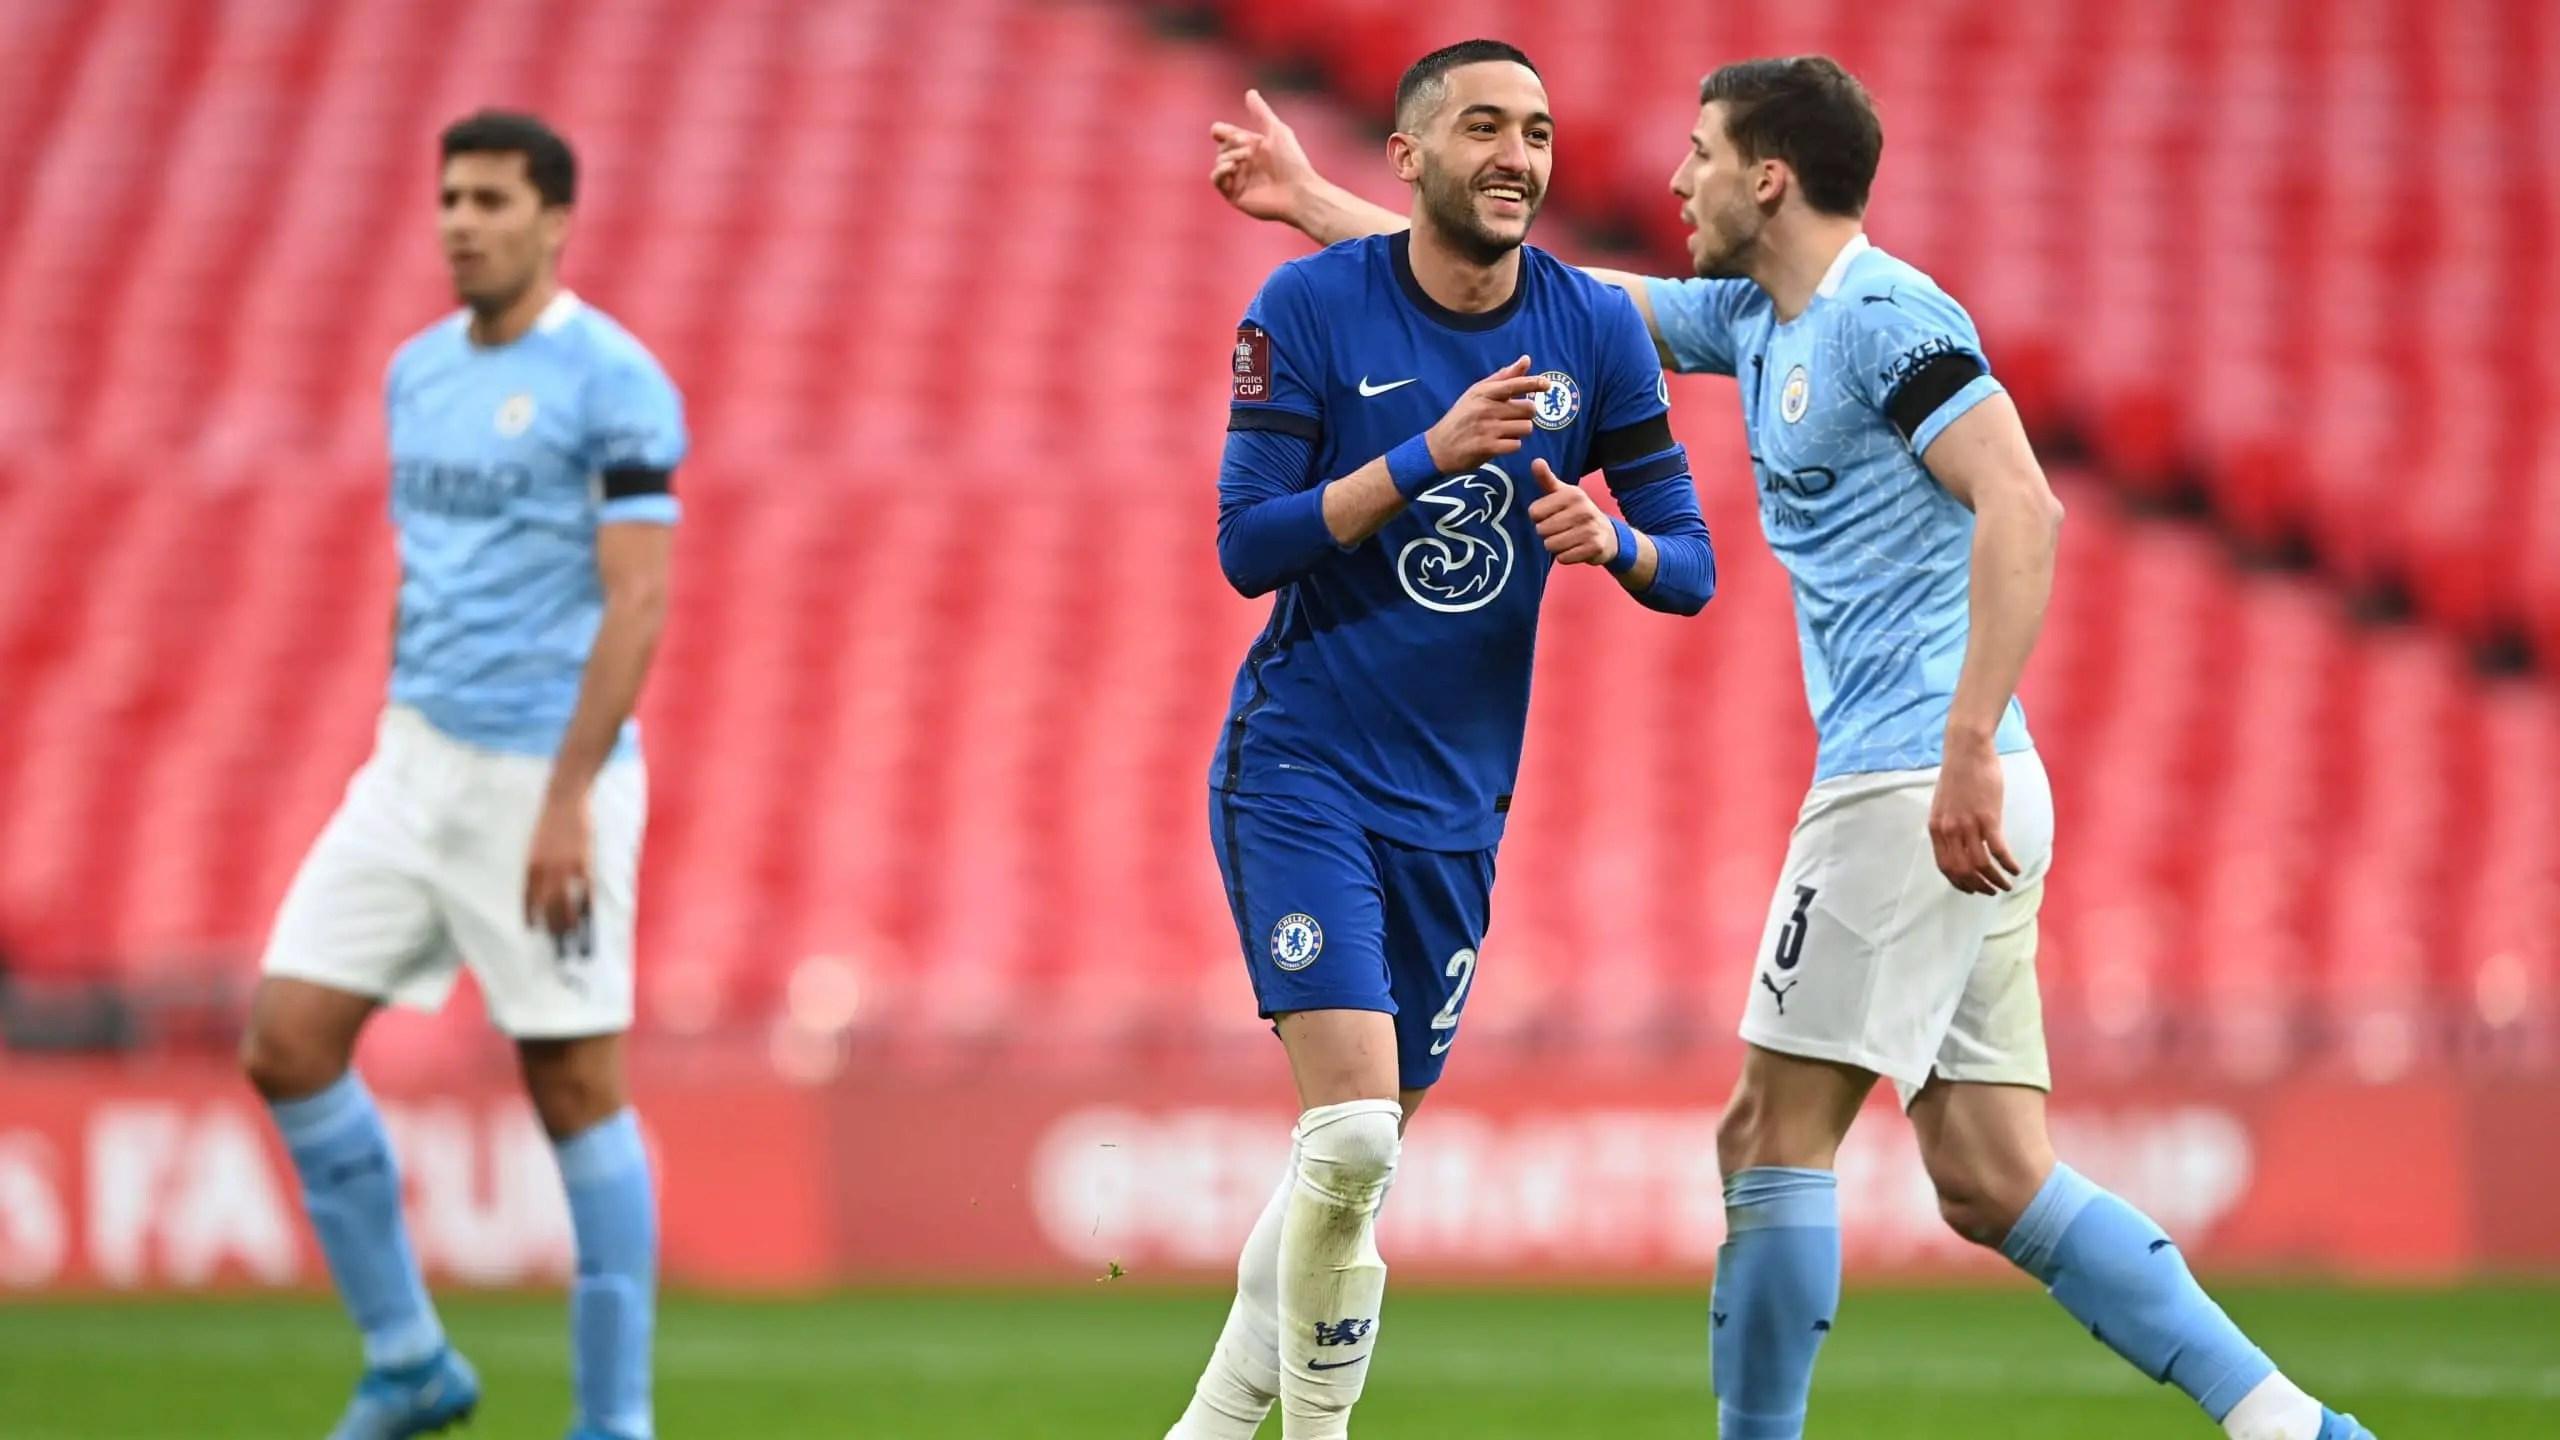 Chelsea Reach FA Cup Final, End Manchester   City's Quadruple Bid